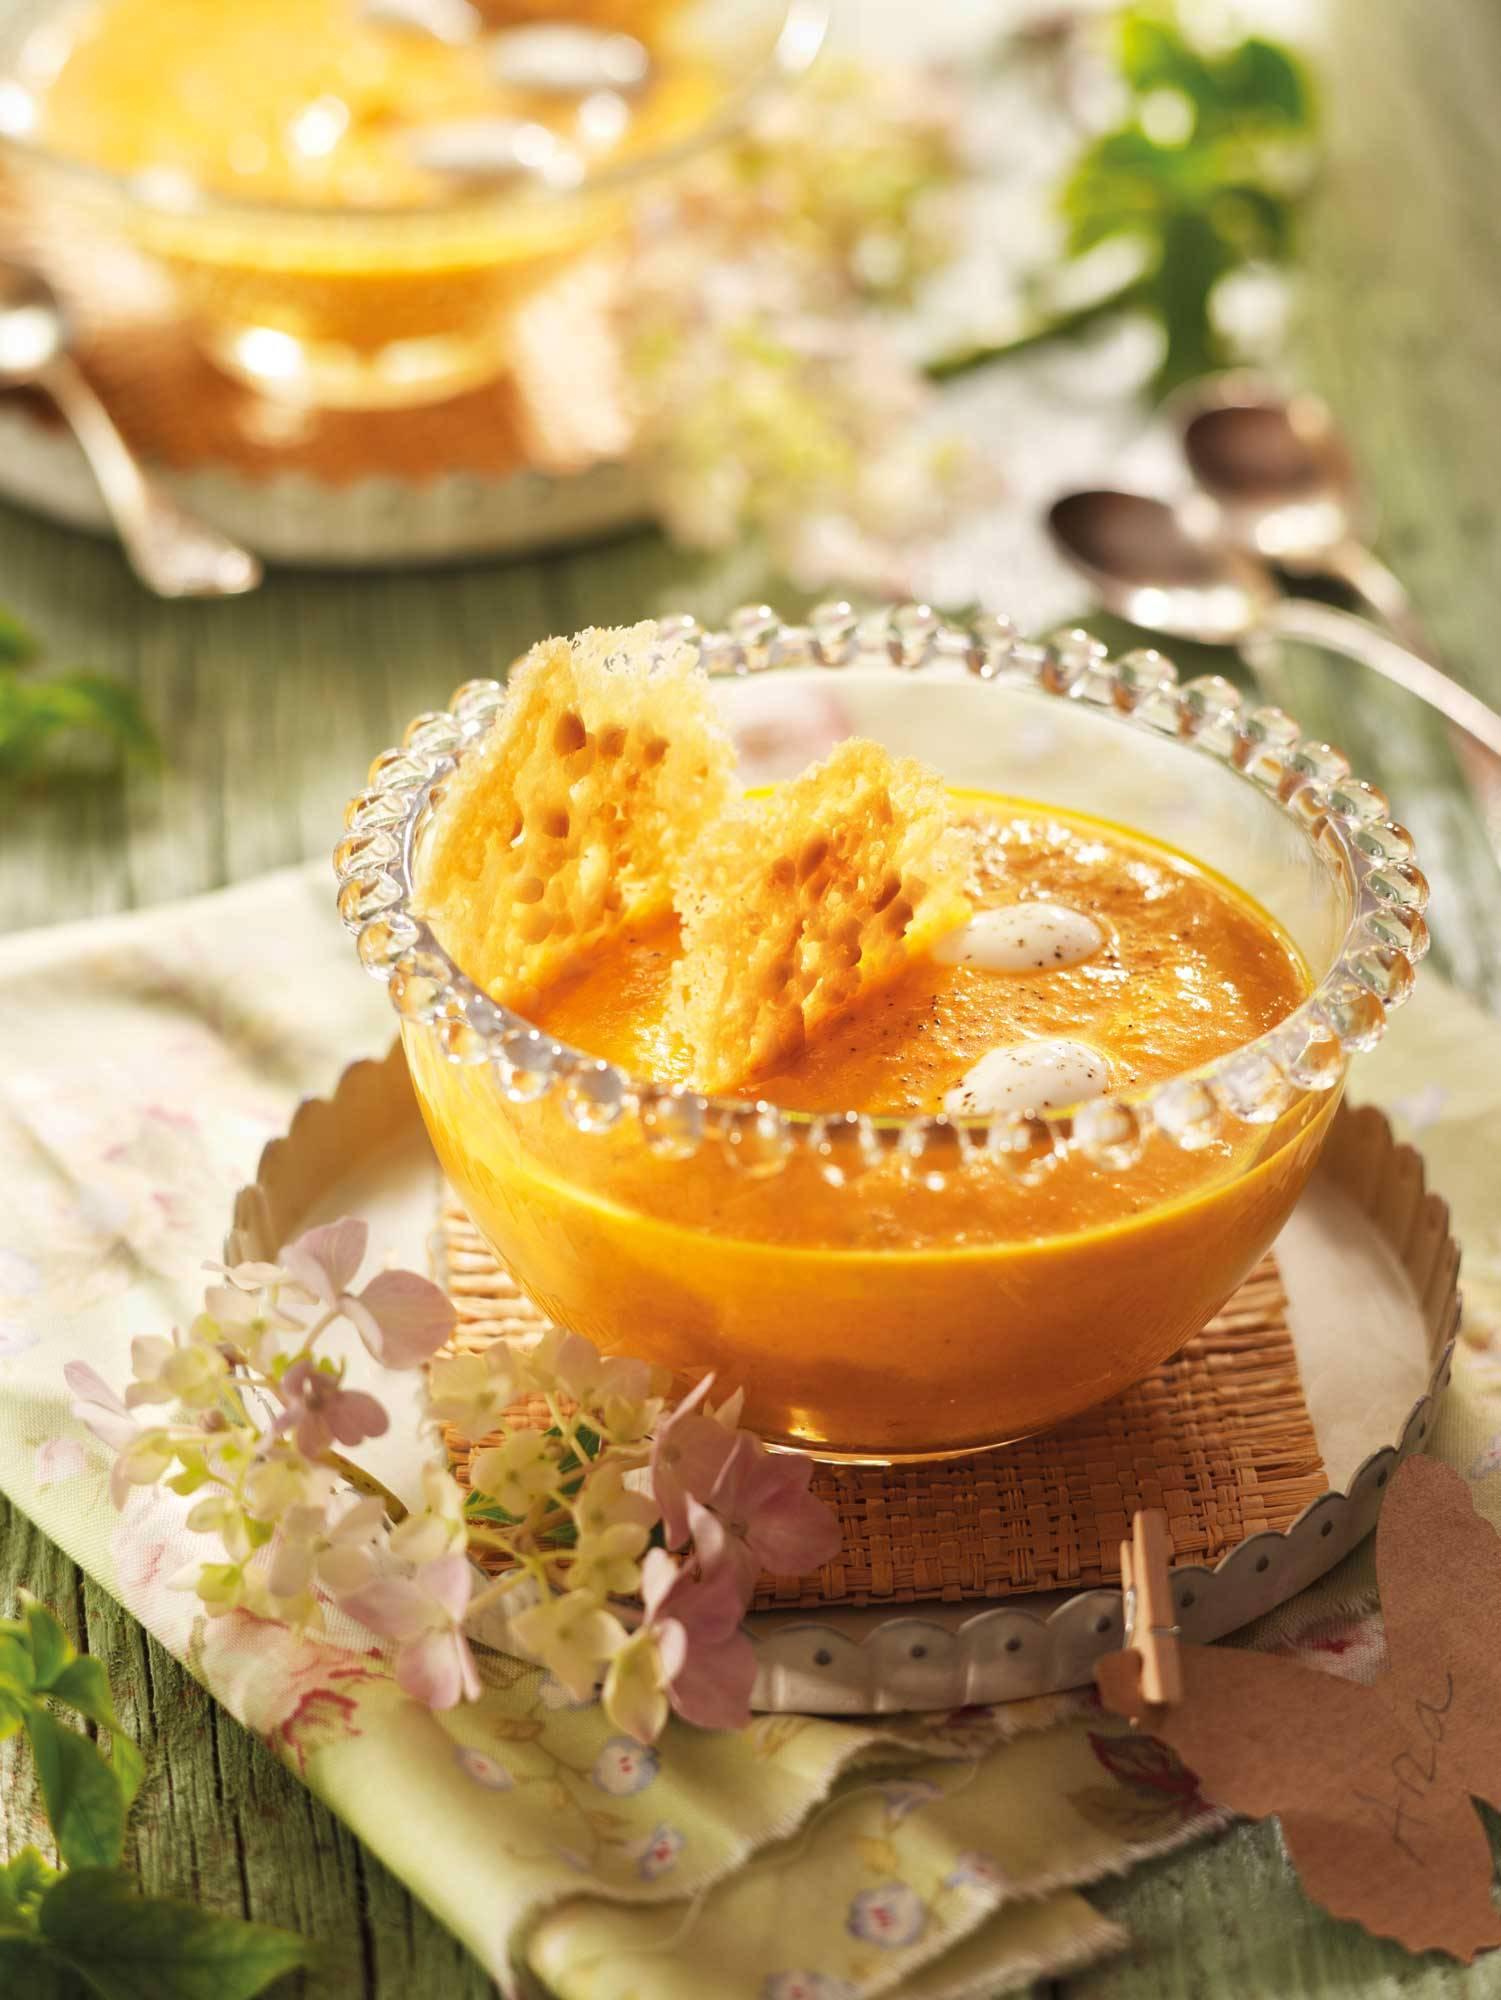 recipes-improve-health-cream-carrot 00388402